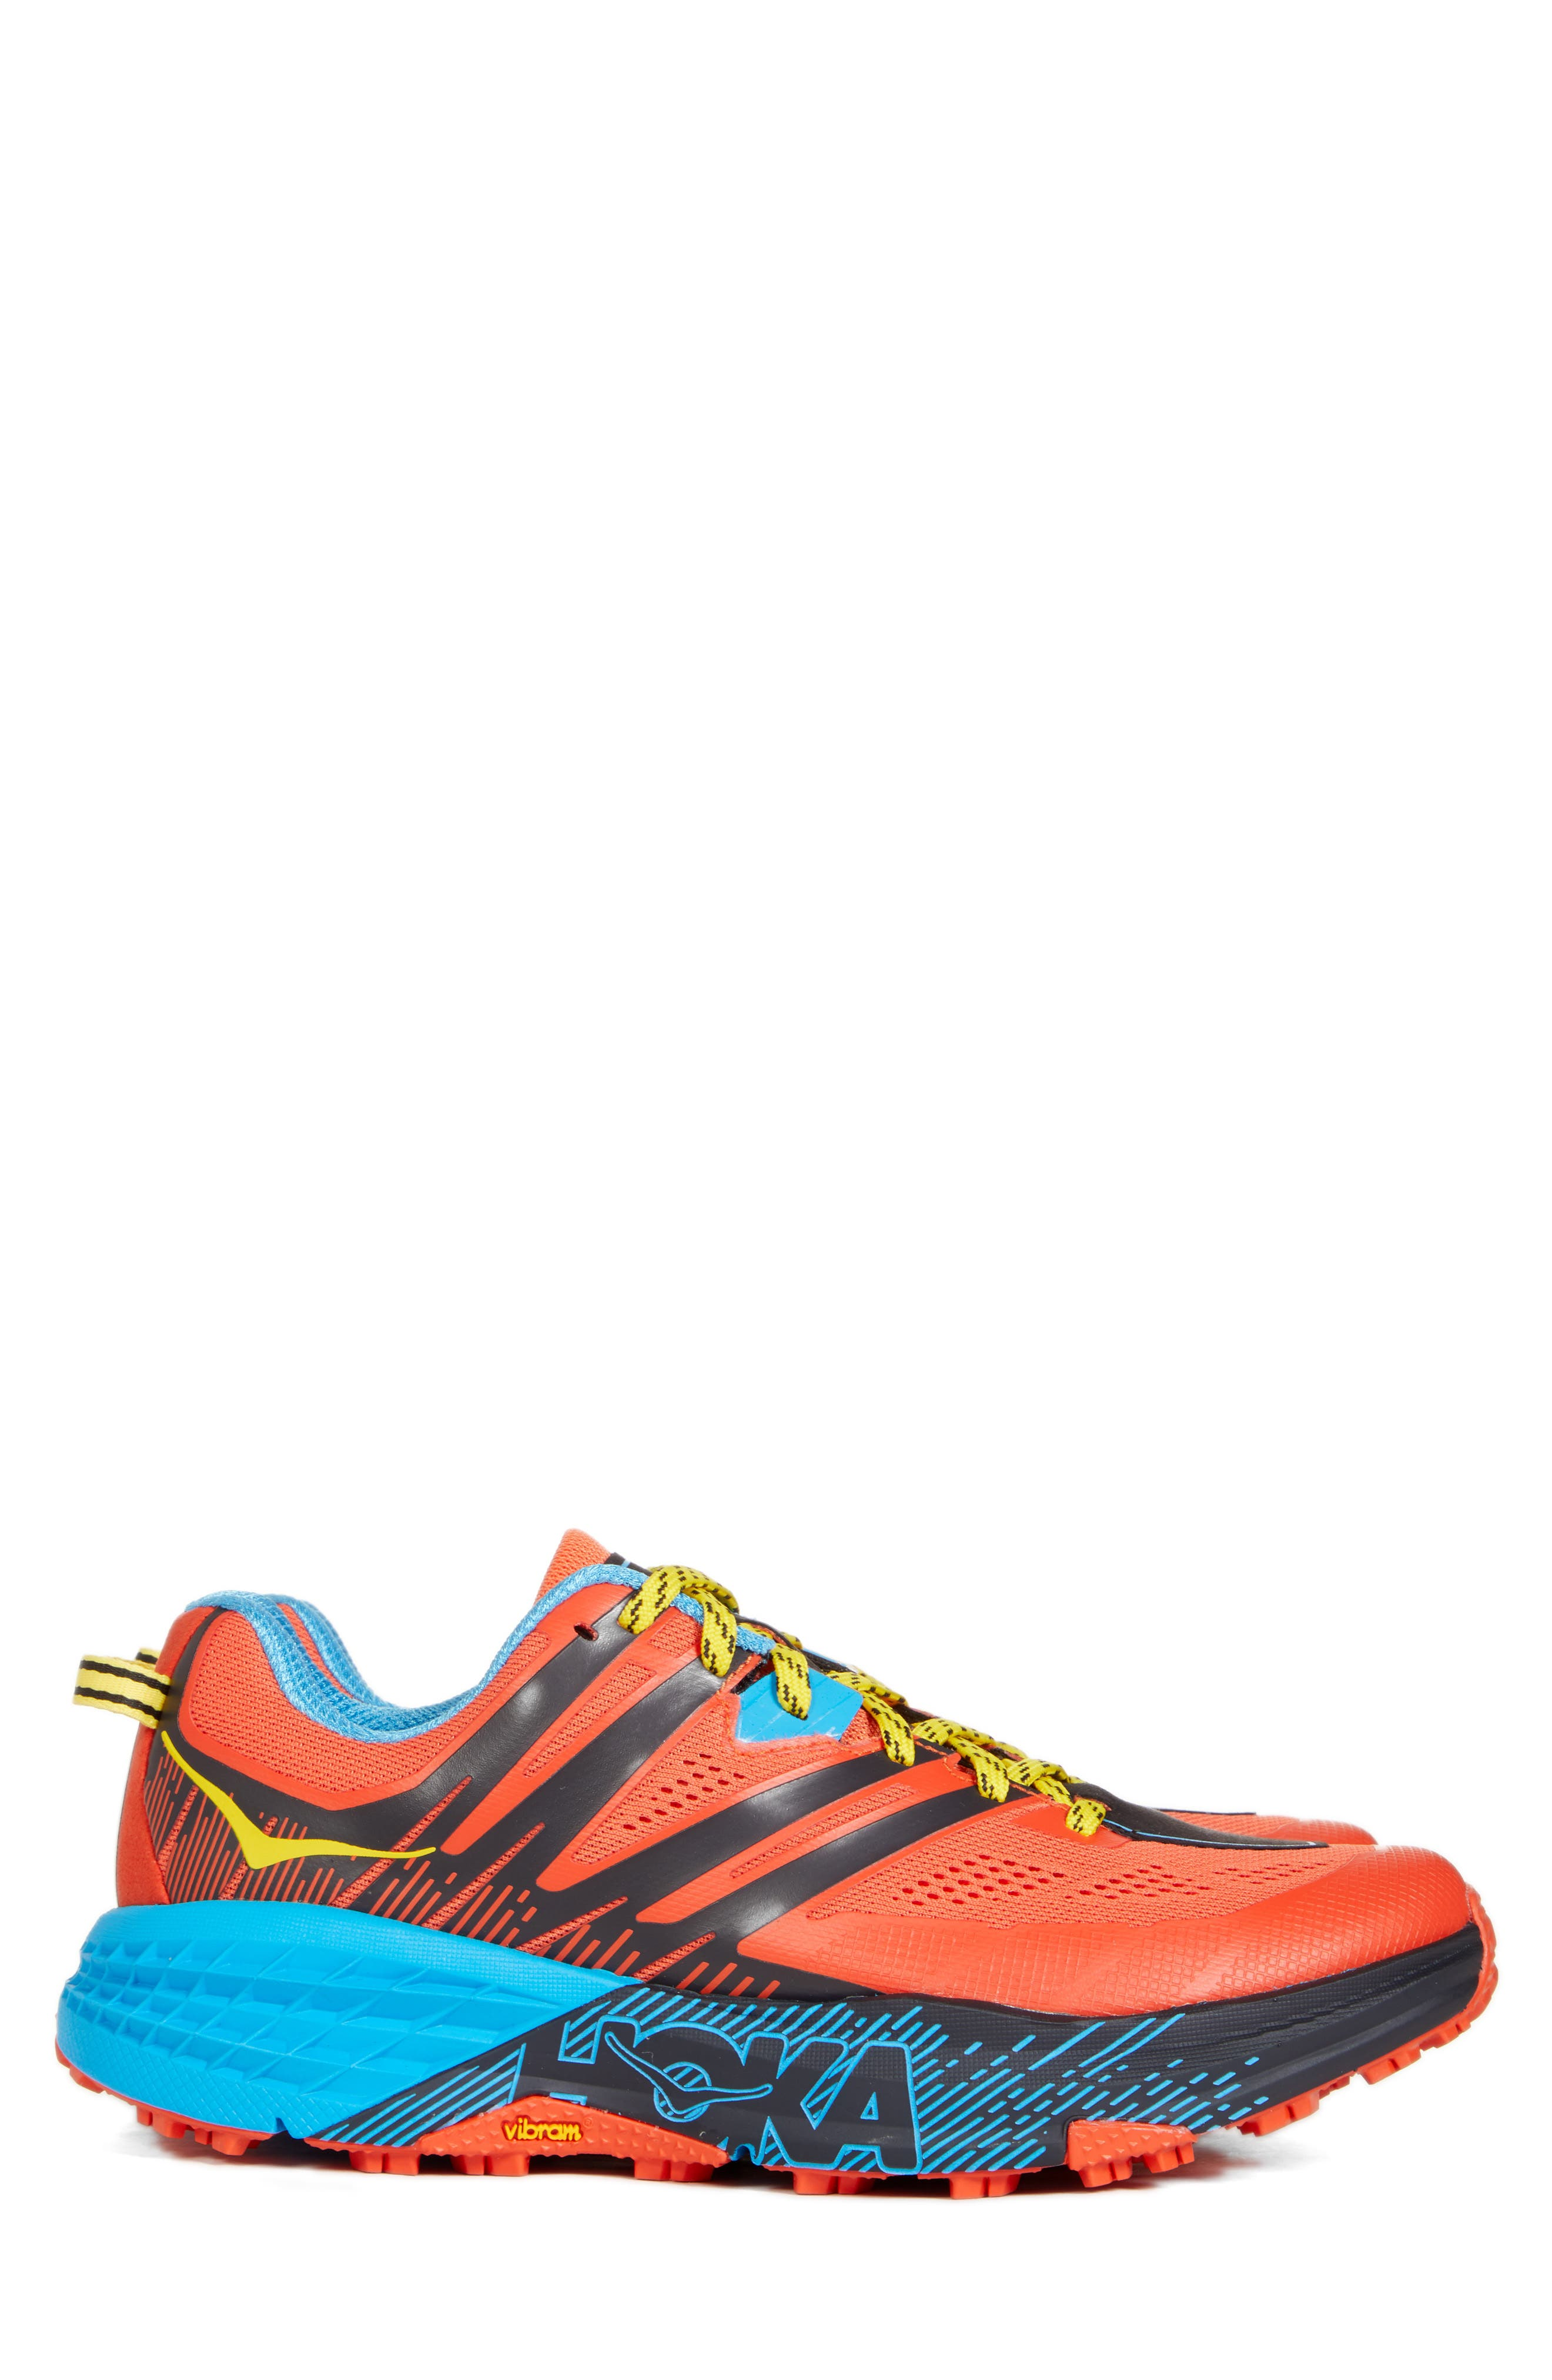 HOKA ONE ONE,  Speedgoat 3 Trail Running Shoe, Main thumbnail 1, color, 825